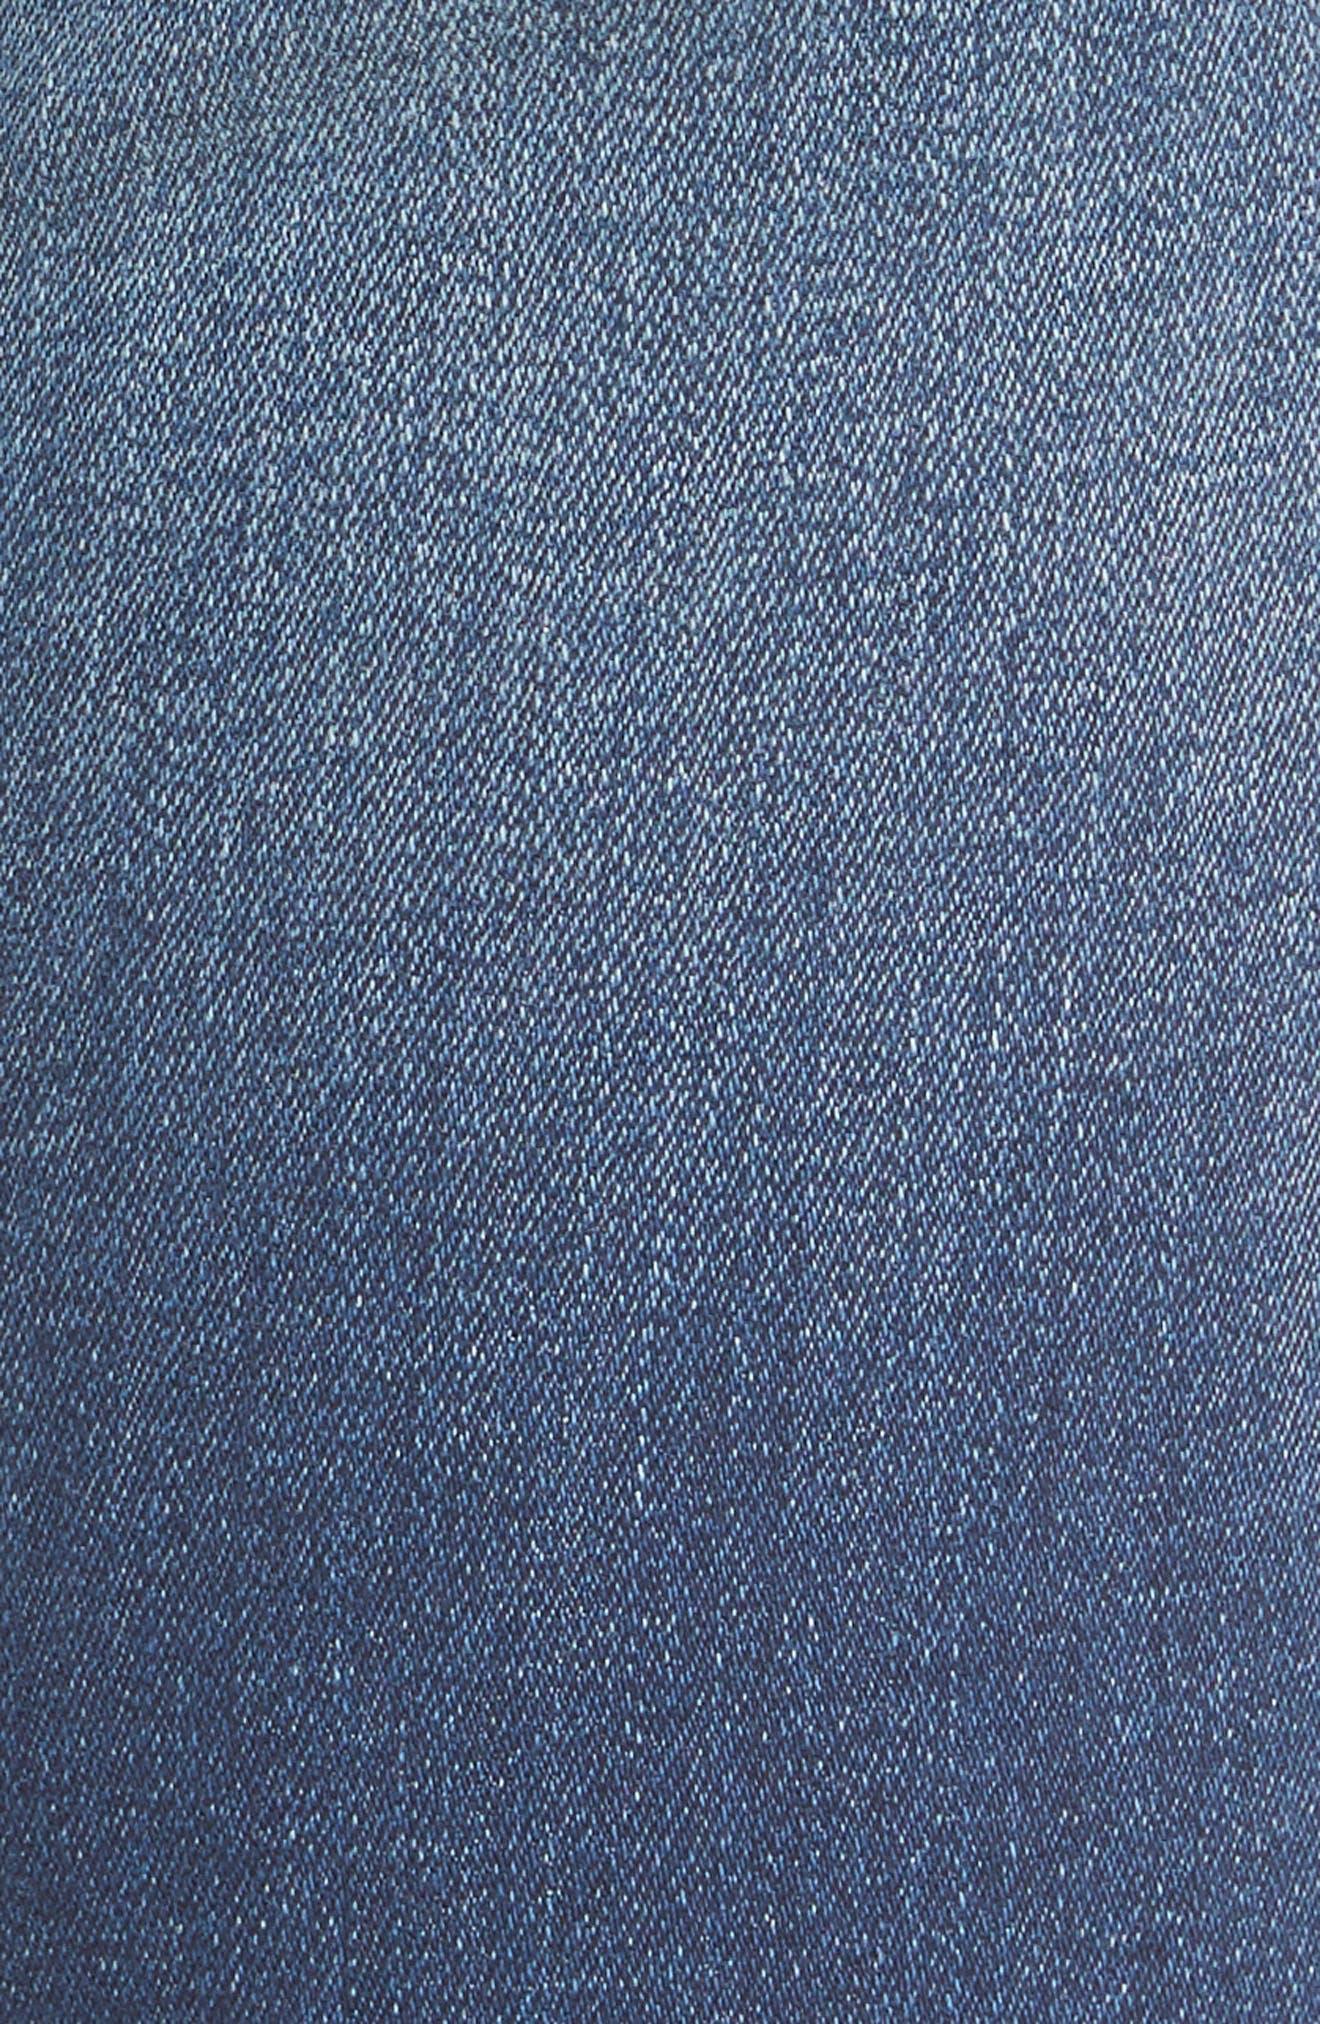 Florence Instasculpt Skinny Jeans,                             Alternate thumbnail 5, color,                             423